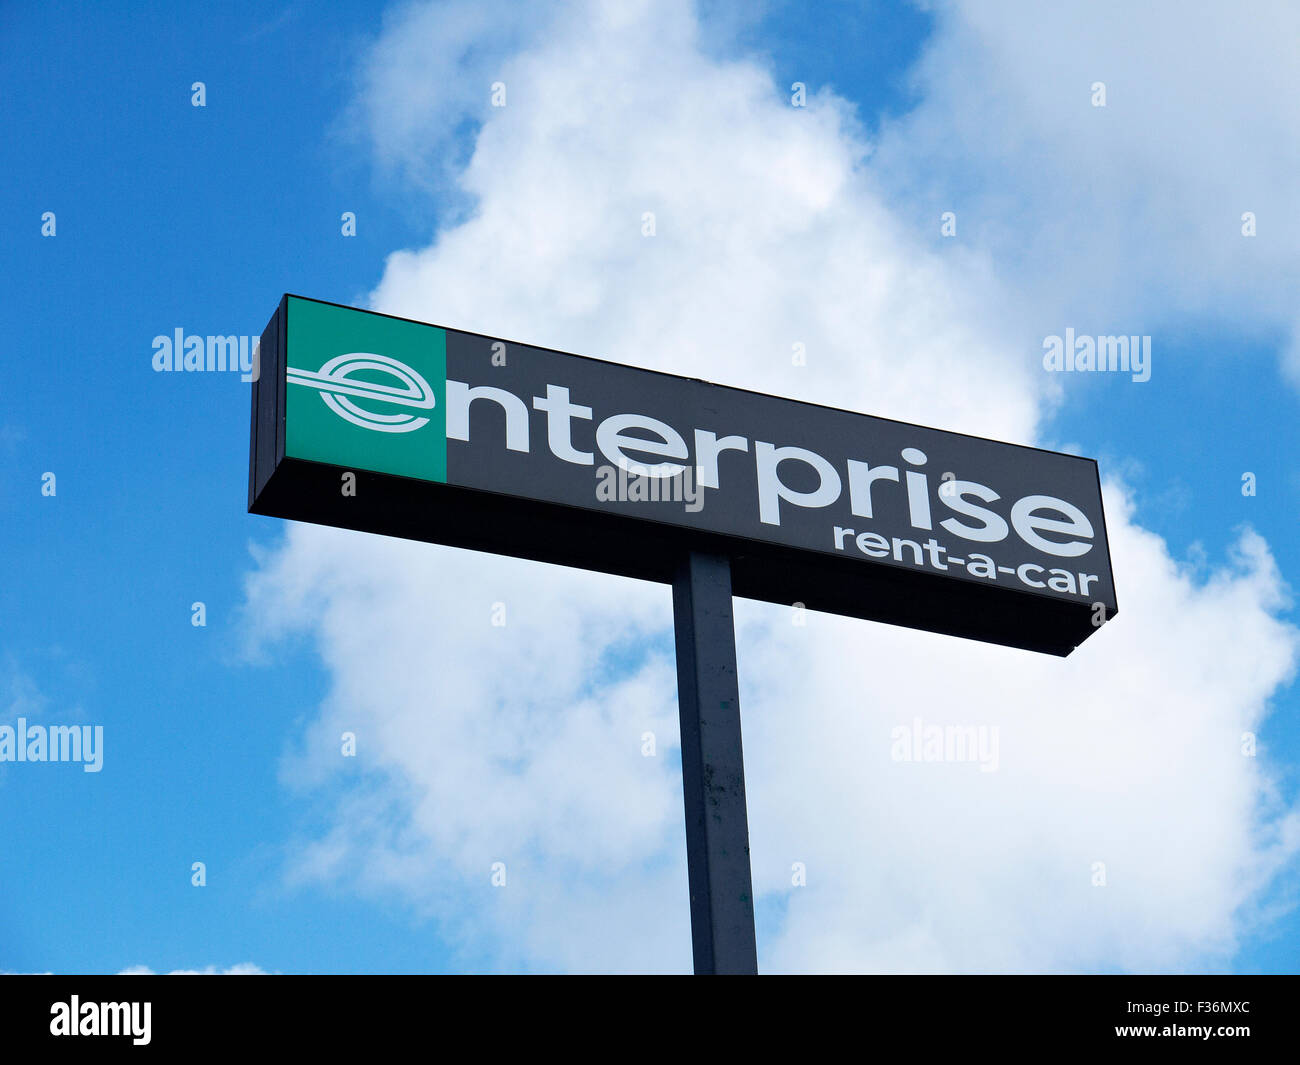 enterprise rent a car signpost uk stock photo royalty free image 88043940 alamy. Black Bedroom Furniture Sets. Home Design Ideas